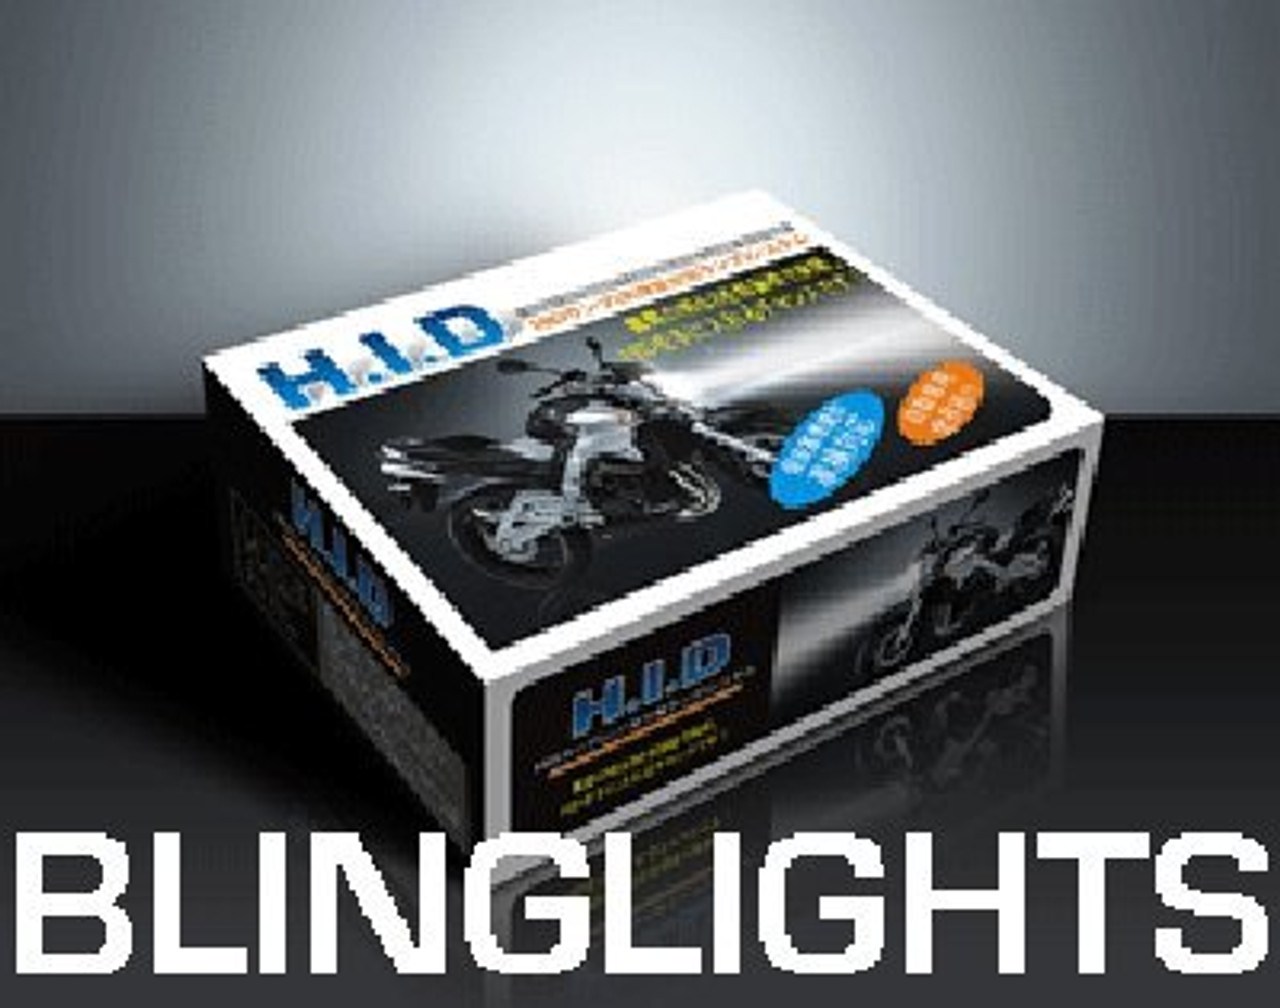 1993-2009 HARLEY-DAVIDSON FATBOY HID XENON HEAD LIGHT HEADLIGHT HEADLAMP KIT 2006 2007 2008 2009